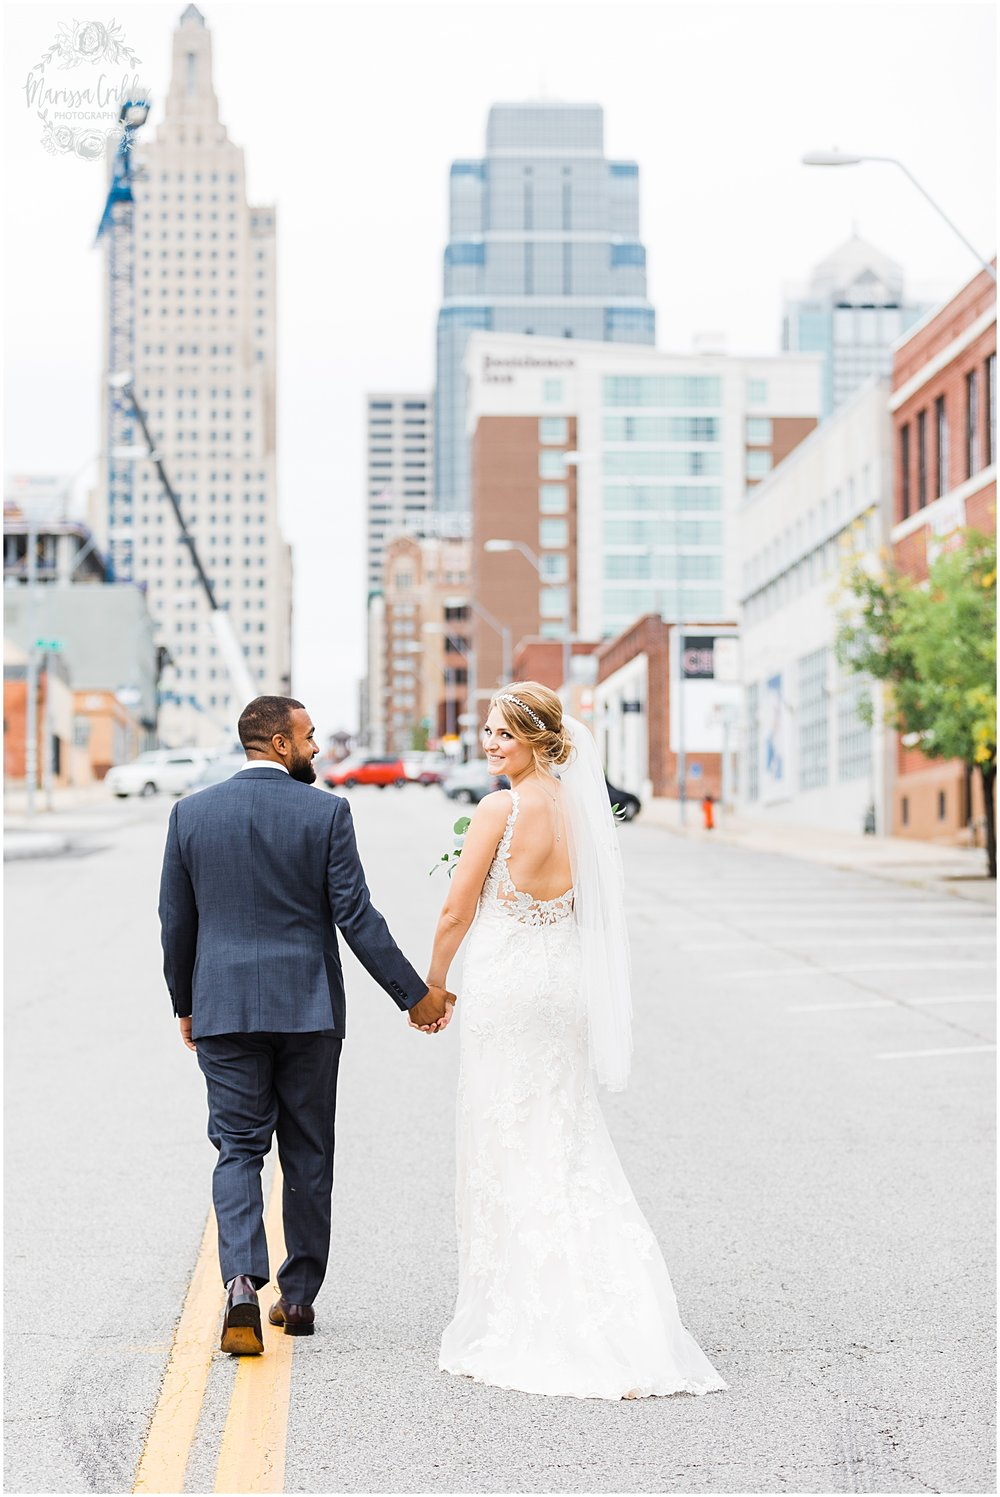 BAUER WEDDING | KELSEA & JUSTIN | MARISSA CRIBBS PHOTOGRAPHY_6542.jpg